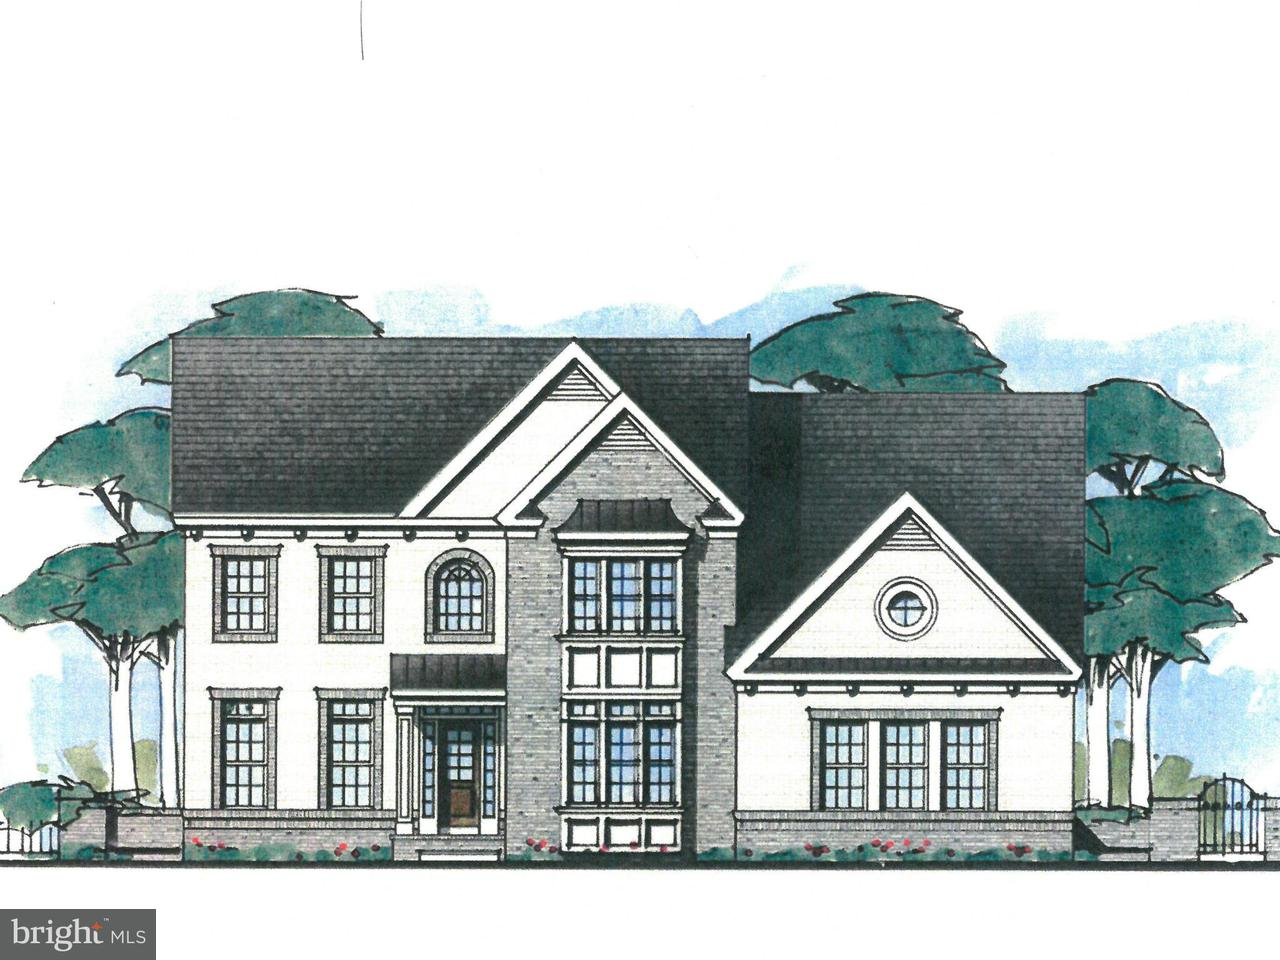 Single Family Home for Sale at 216 MARGARET'S GLEN Lane 216 MARGARET'S GLEN Lane Annapolis, Maryland 21401 United States